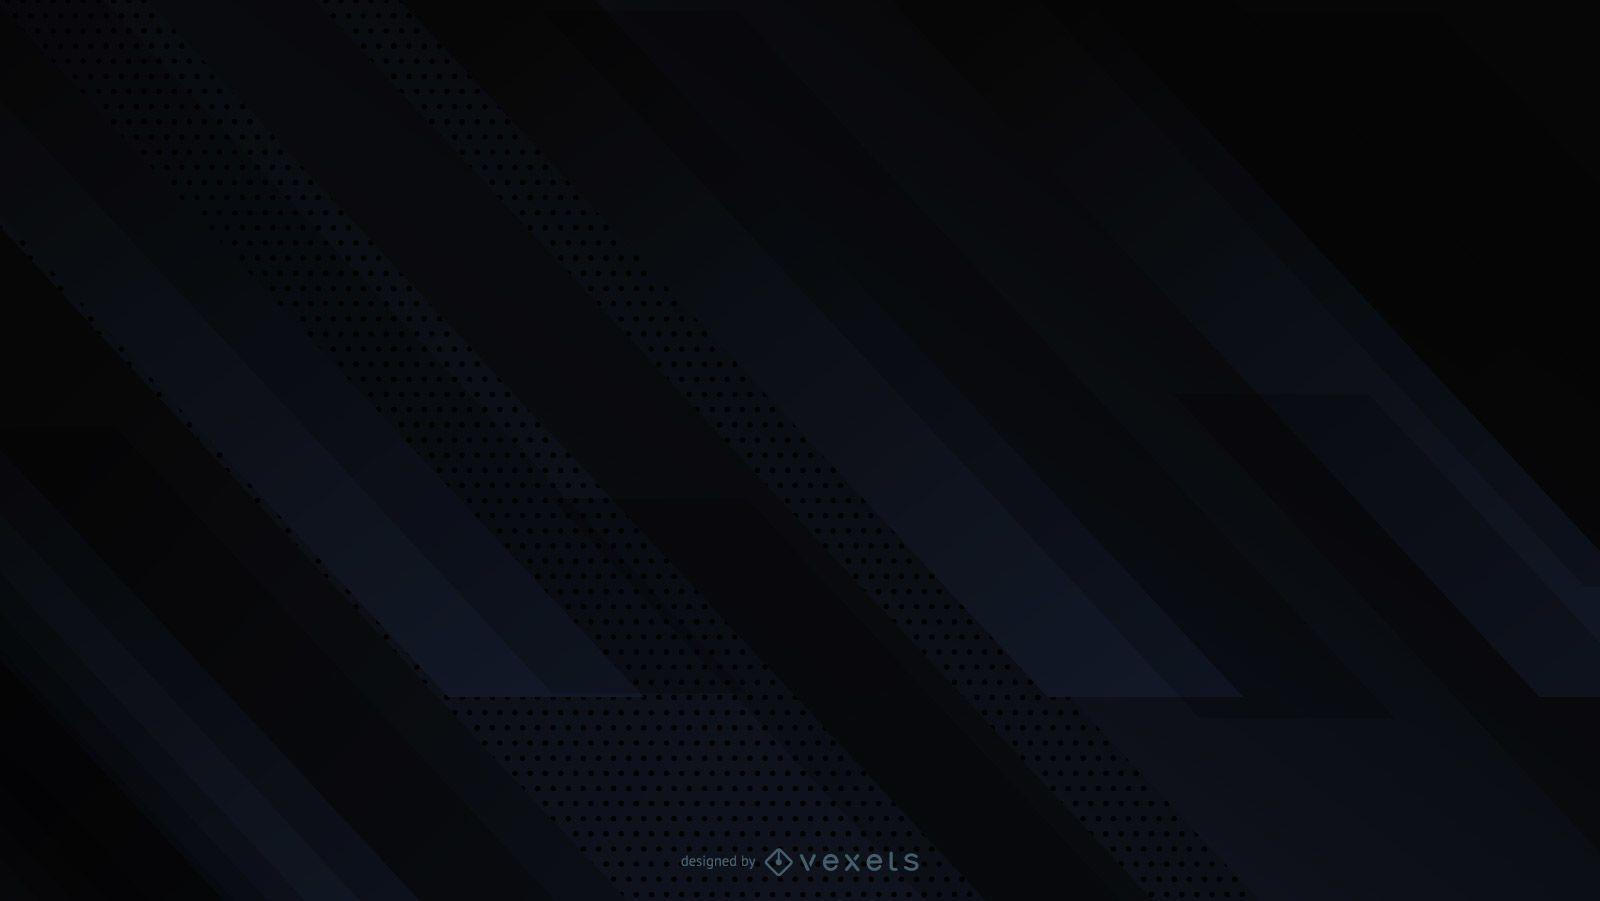 Black background diagonal abstract design